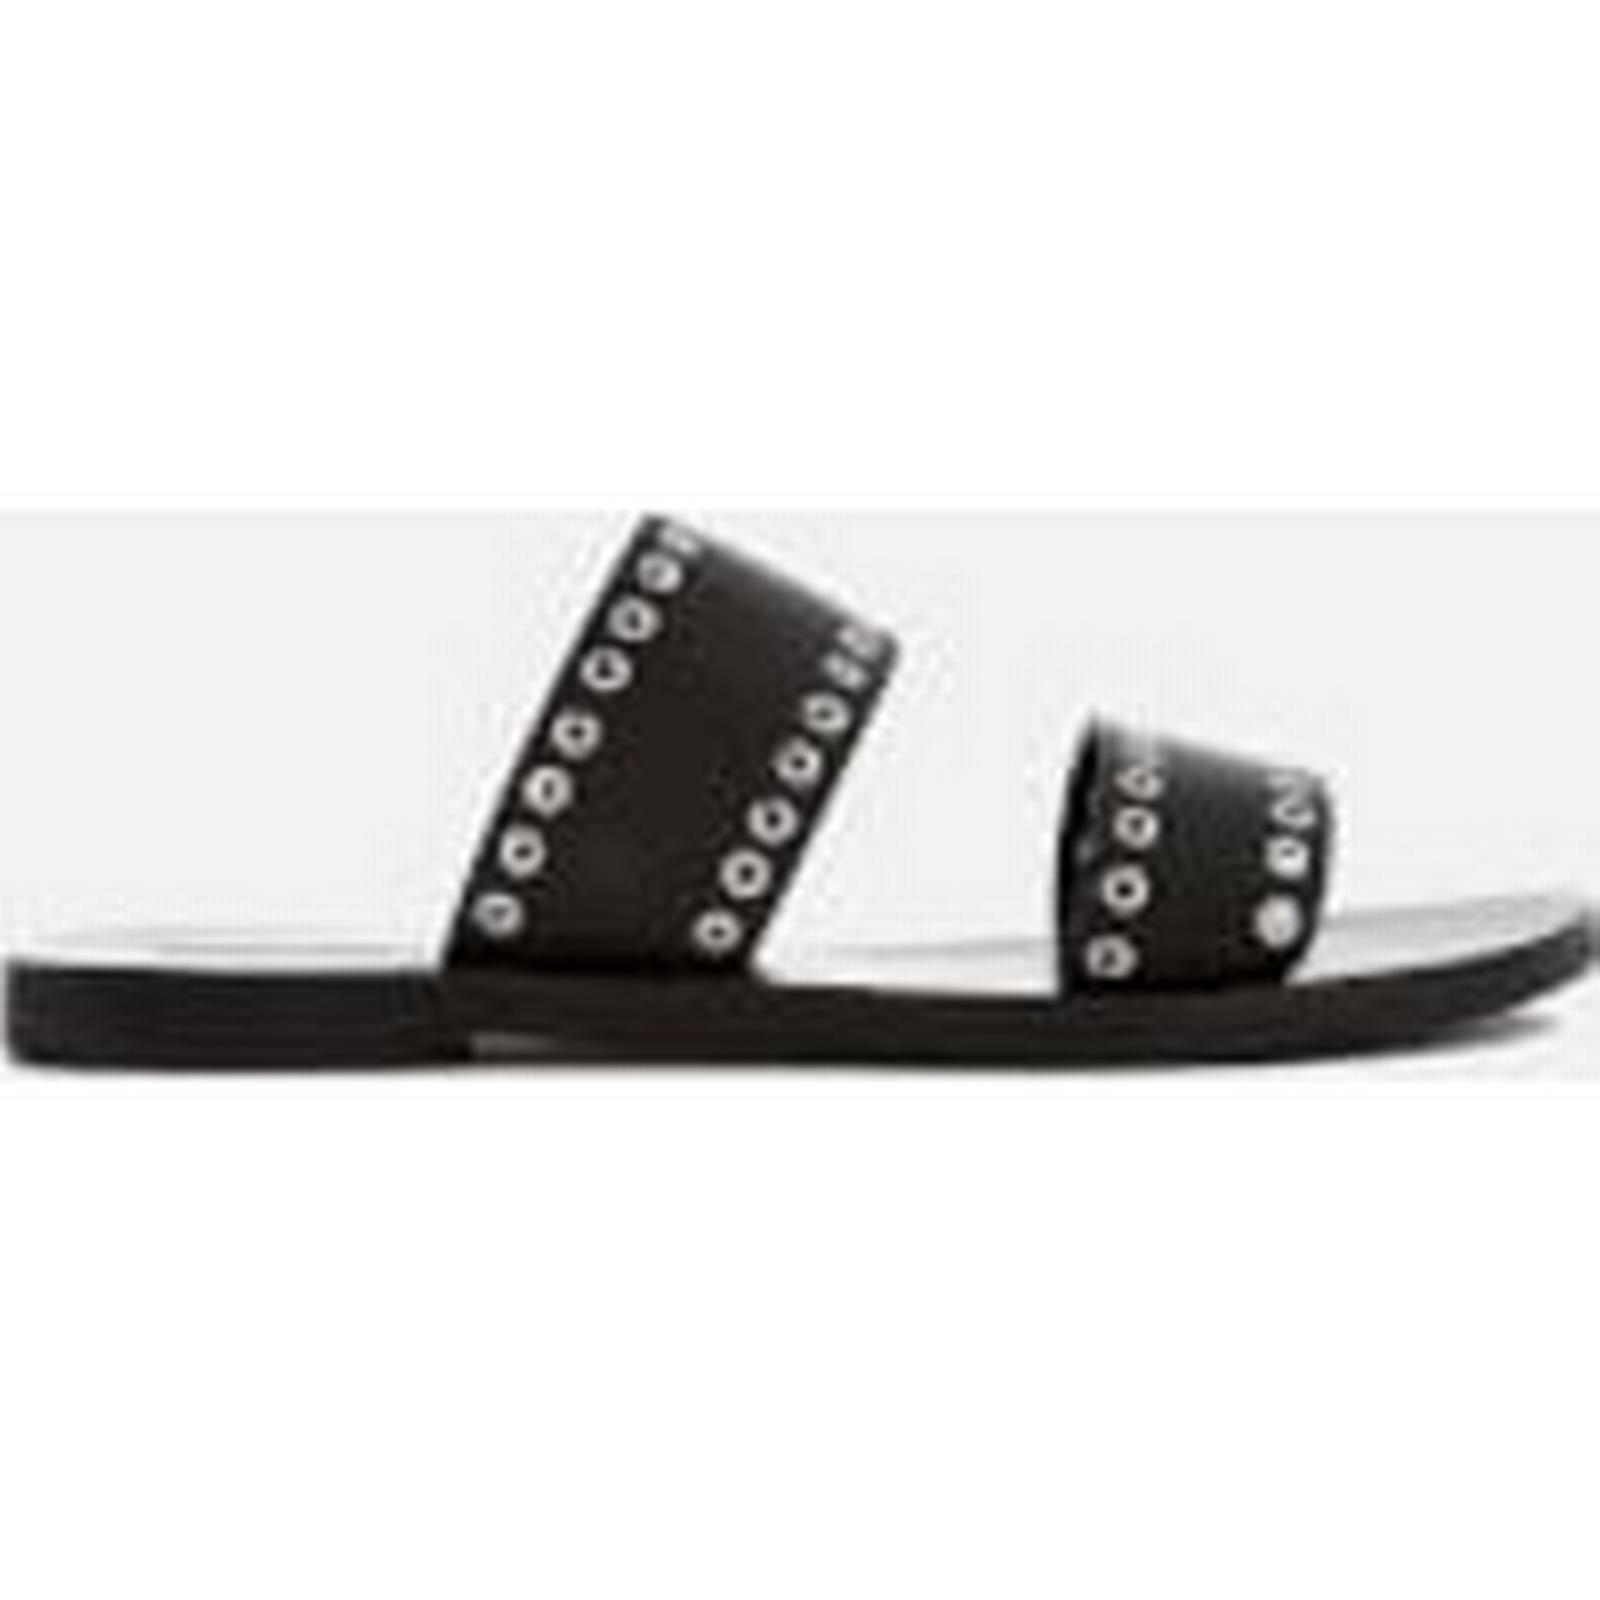 Sol Sana Strap Women's Botany Leather Double Strap Sana Sandals - Black - UK 6 - Black f63686